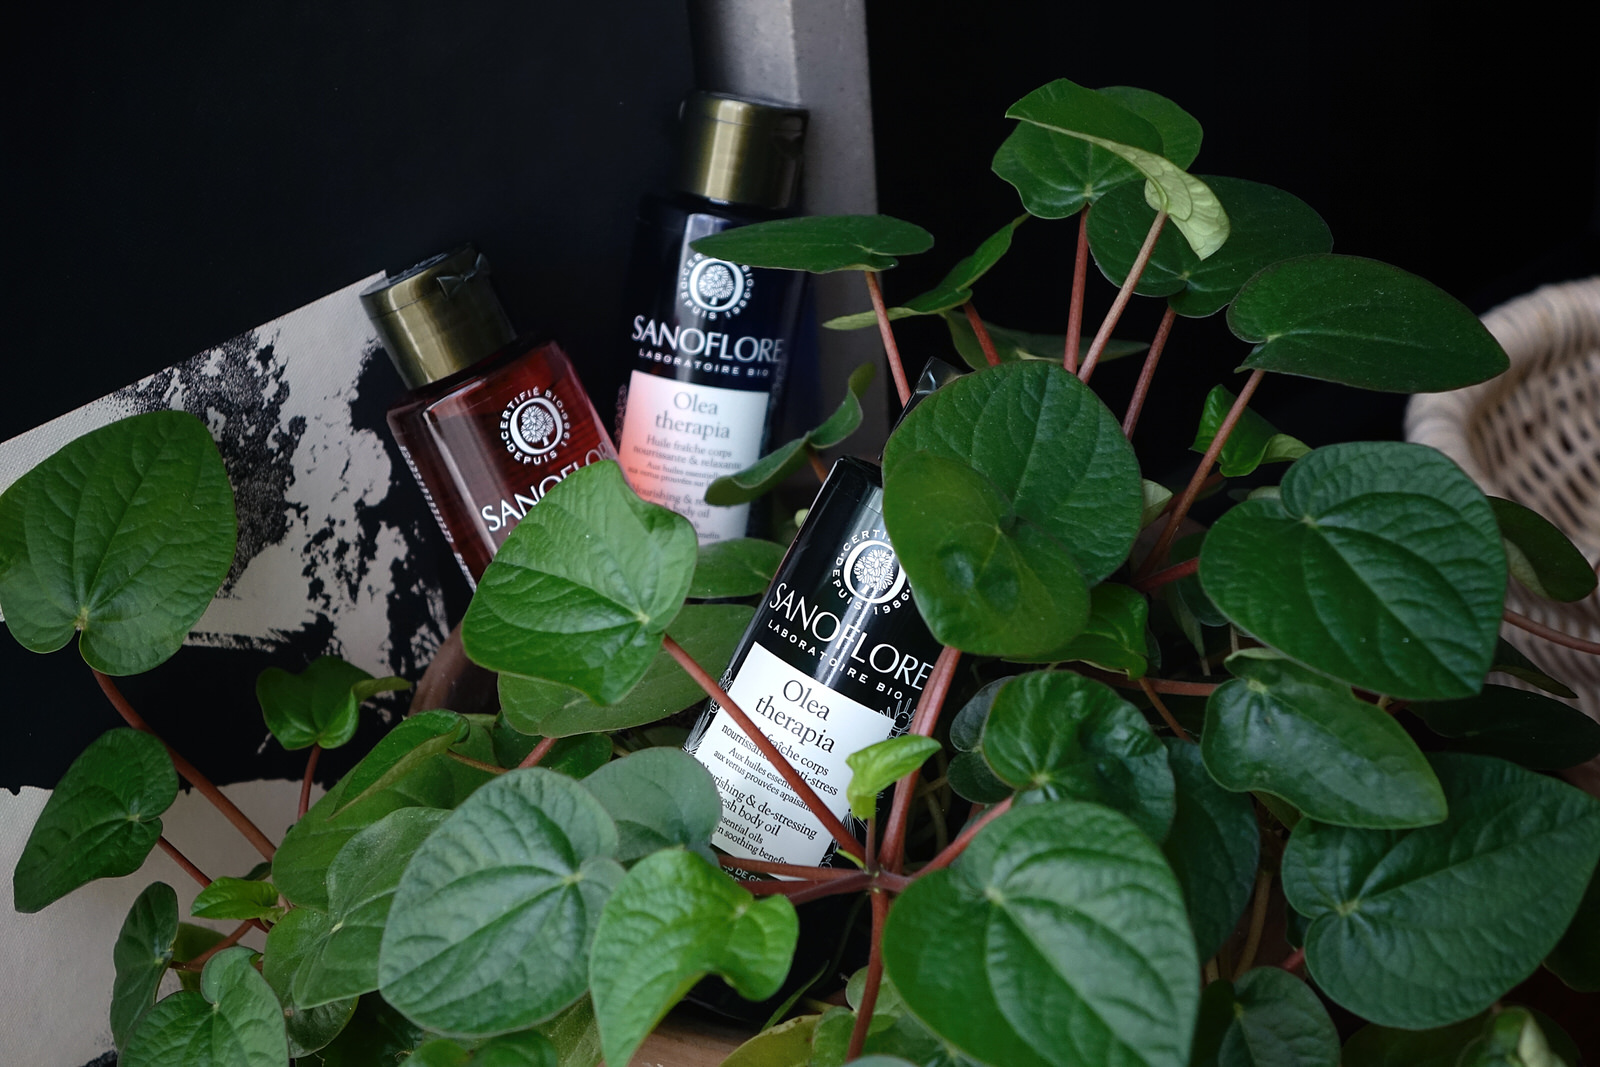 La gamme Olea Therapia de Sanoflore